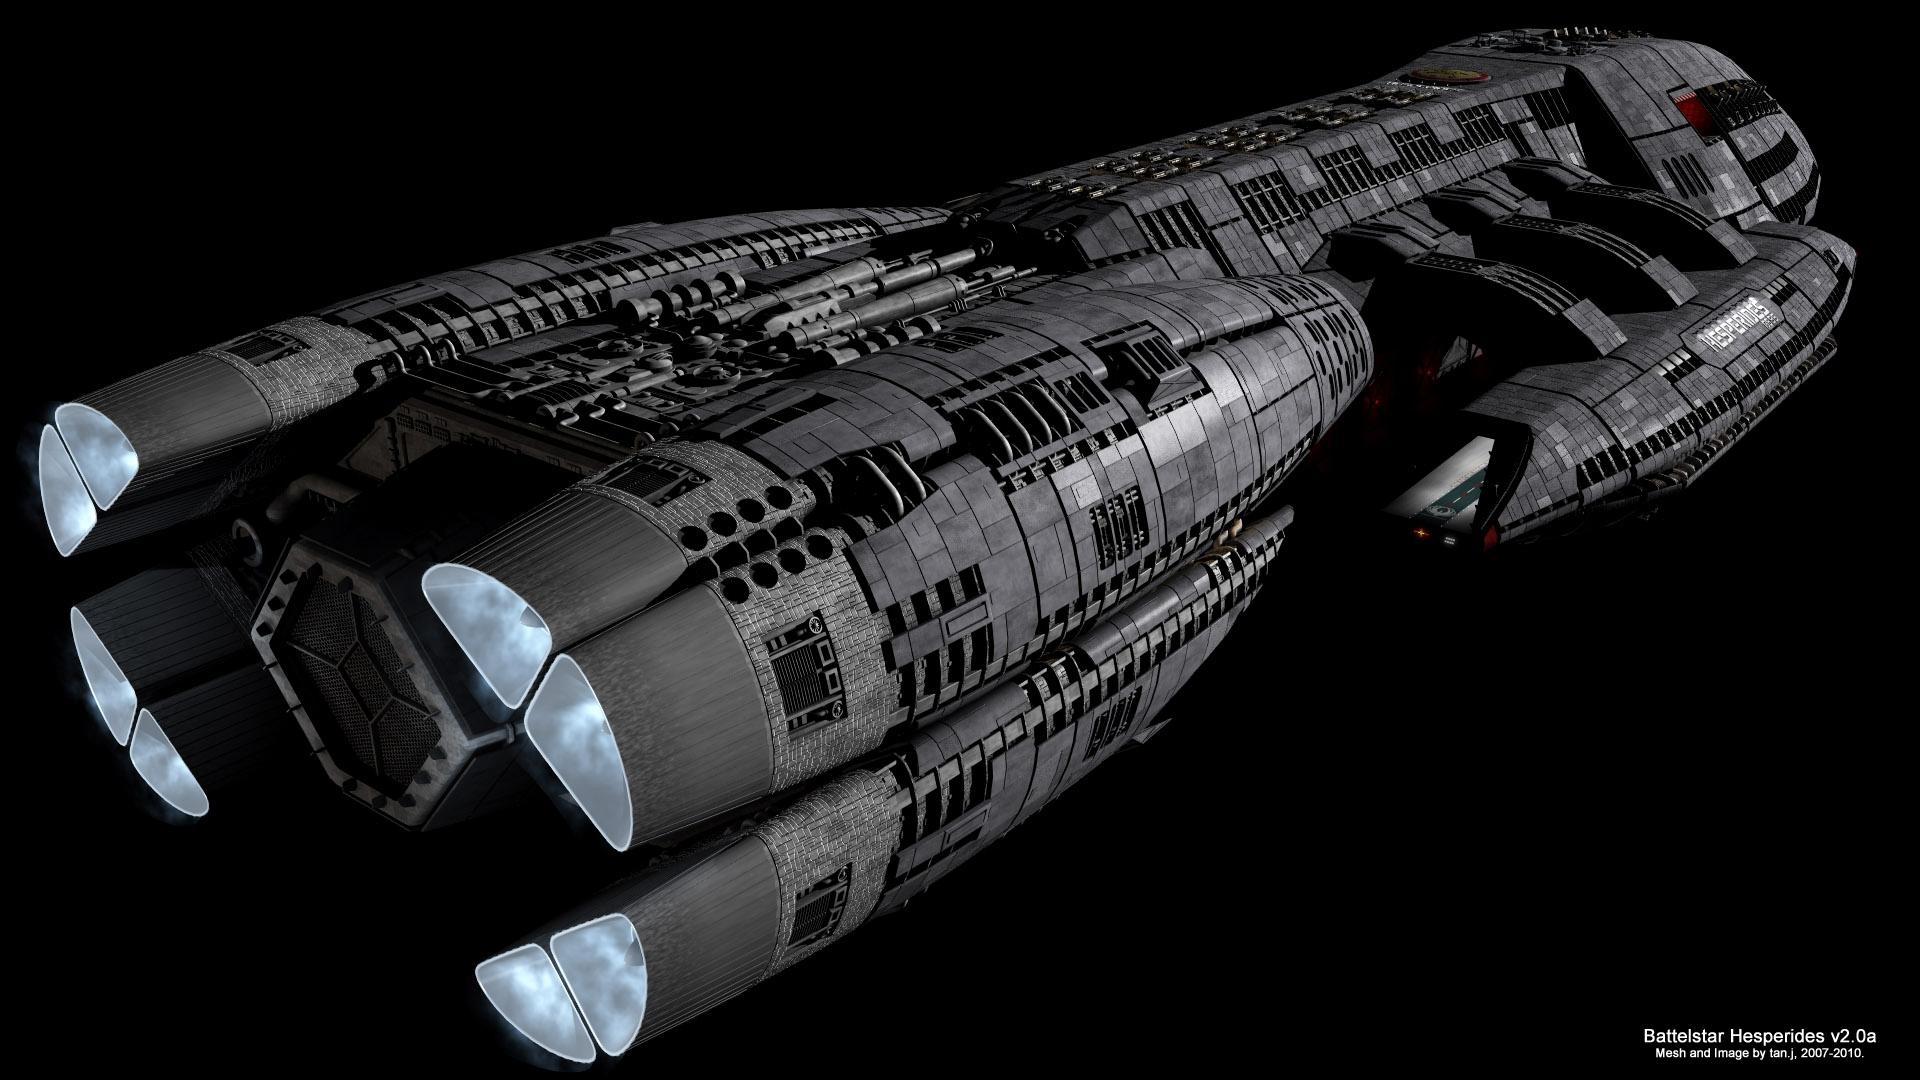 Battlestar HESPERIDES Image